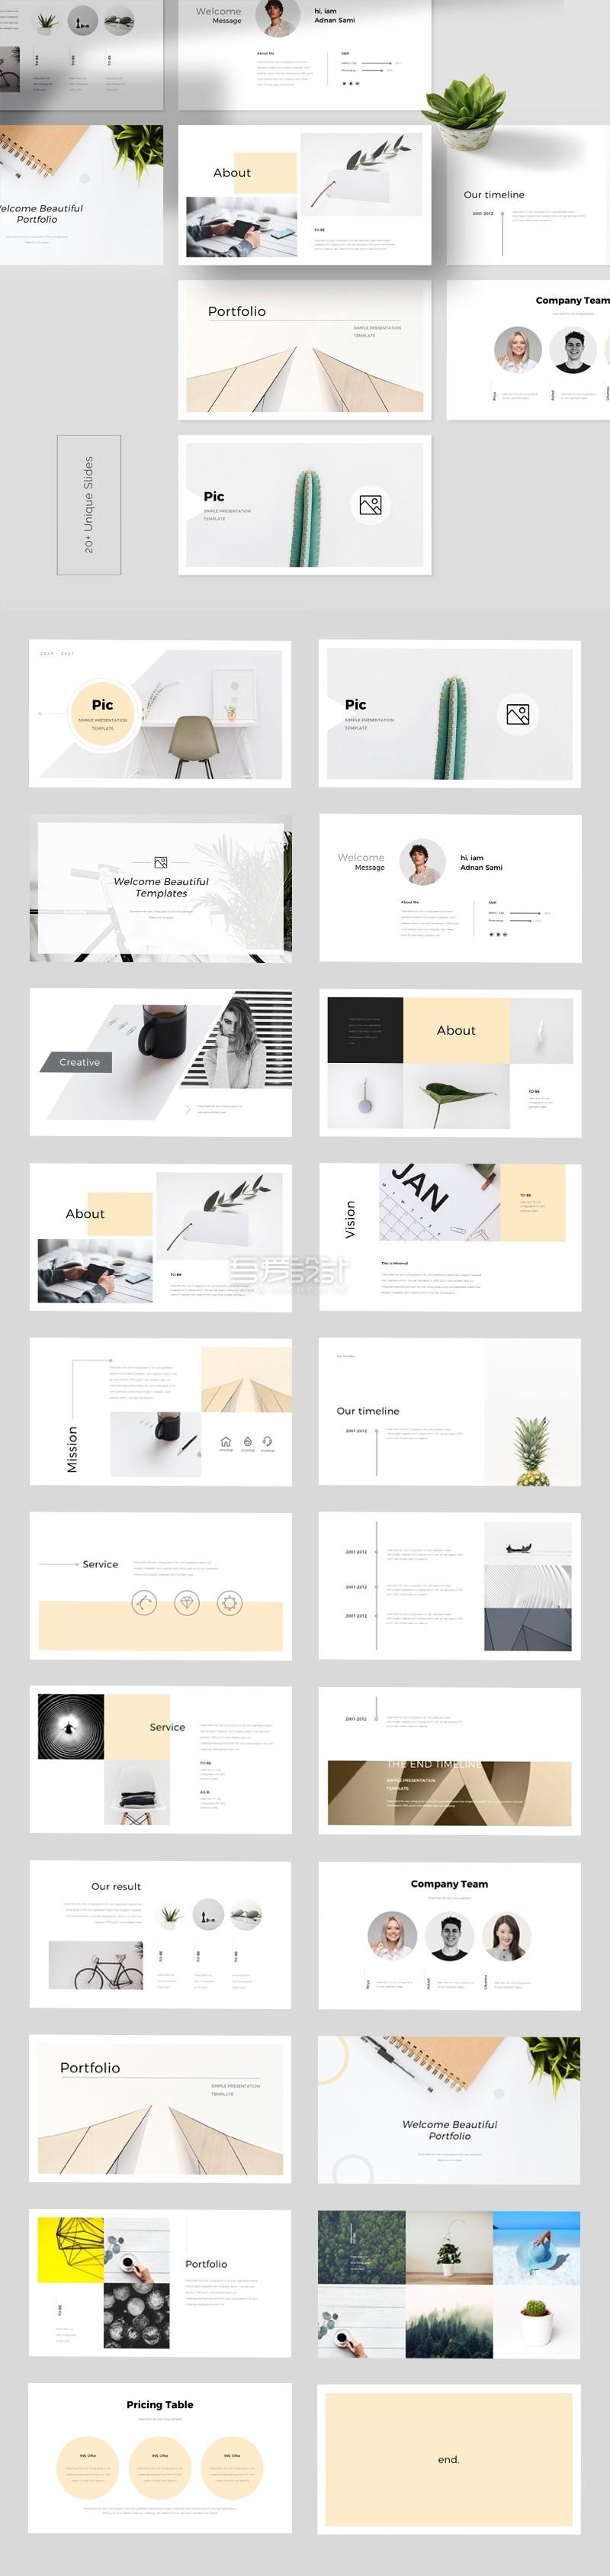 portfolio-powerpoint-template-1582174339-preview_看图王